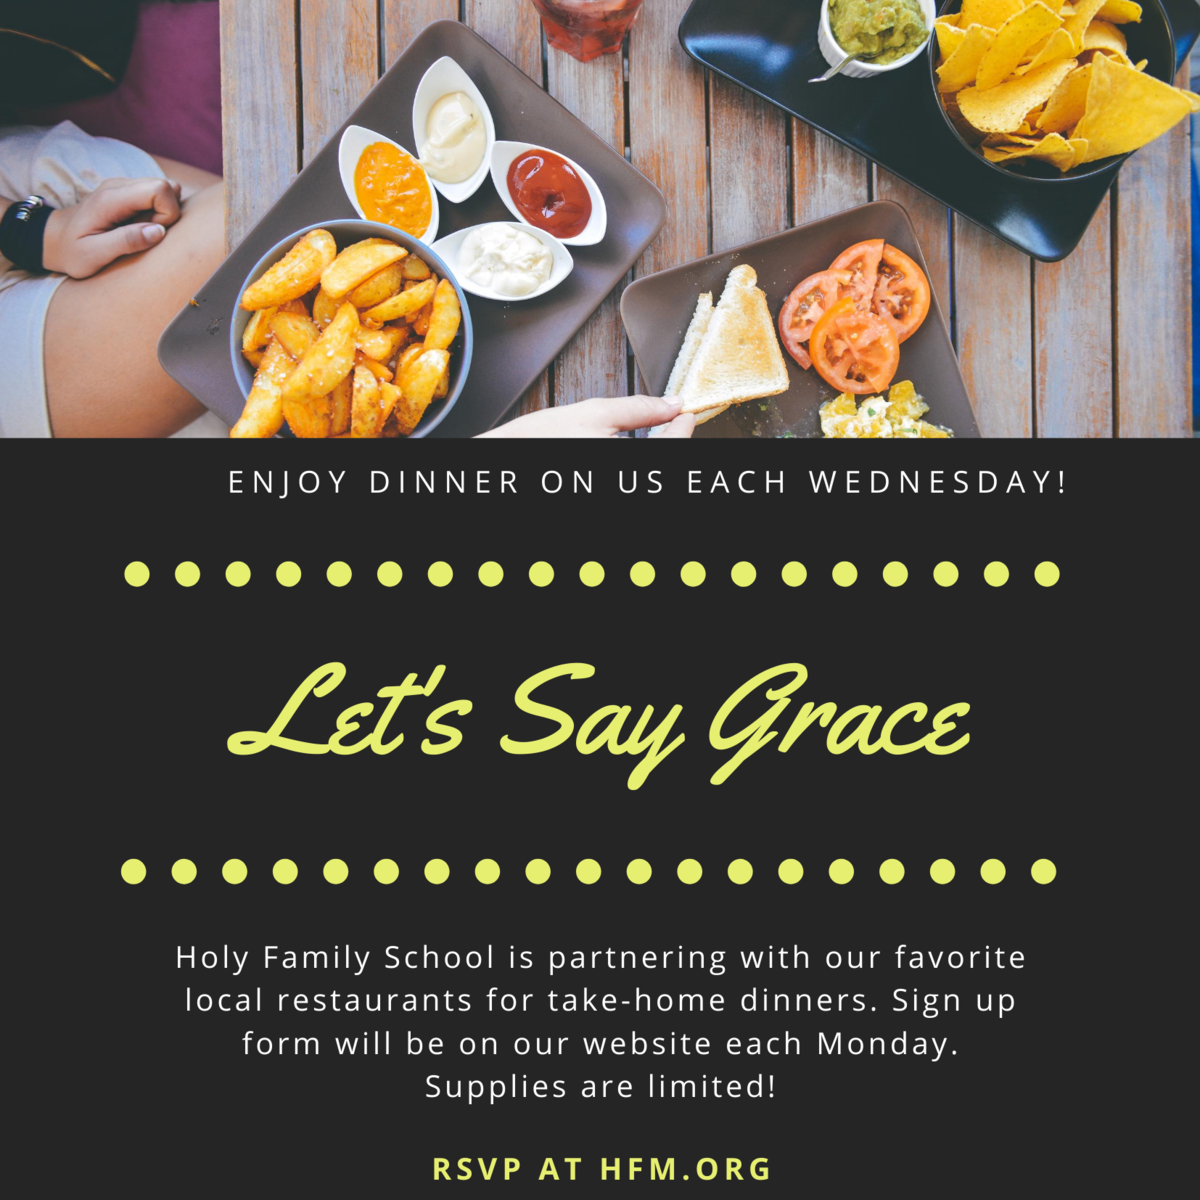 Let's Say Grace flyer